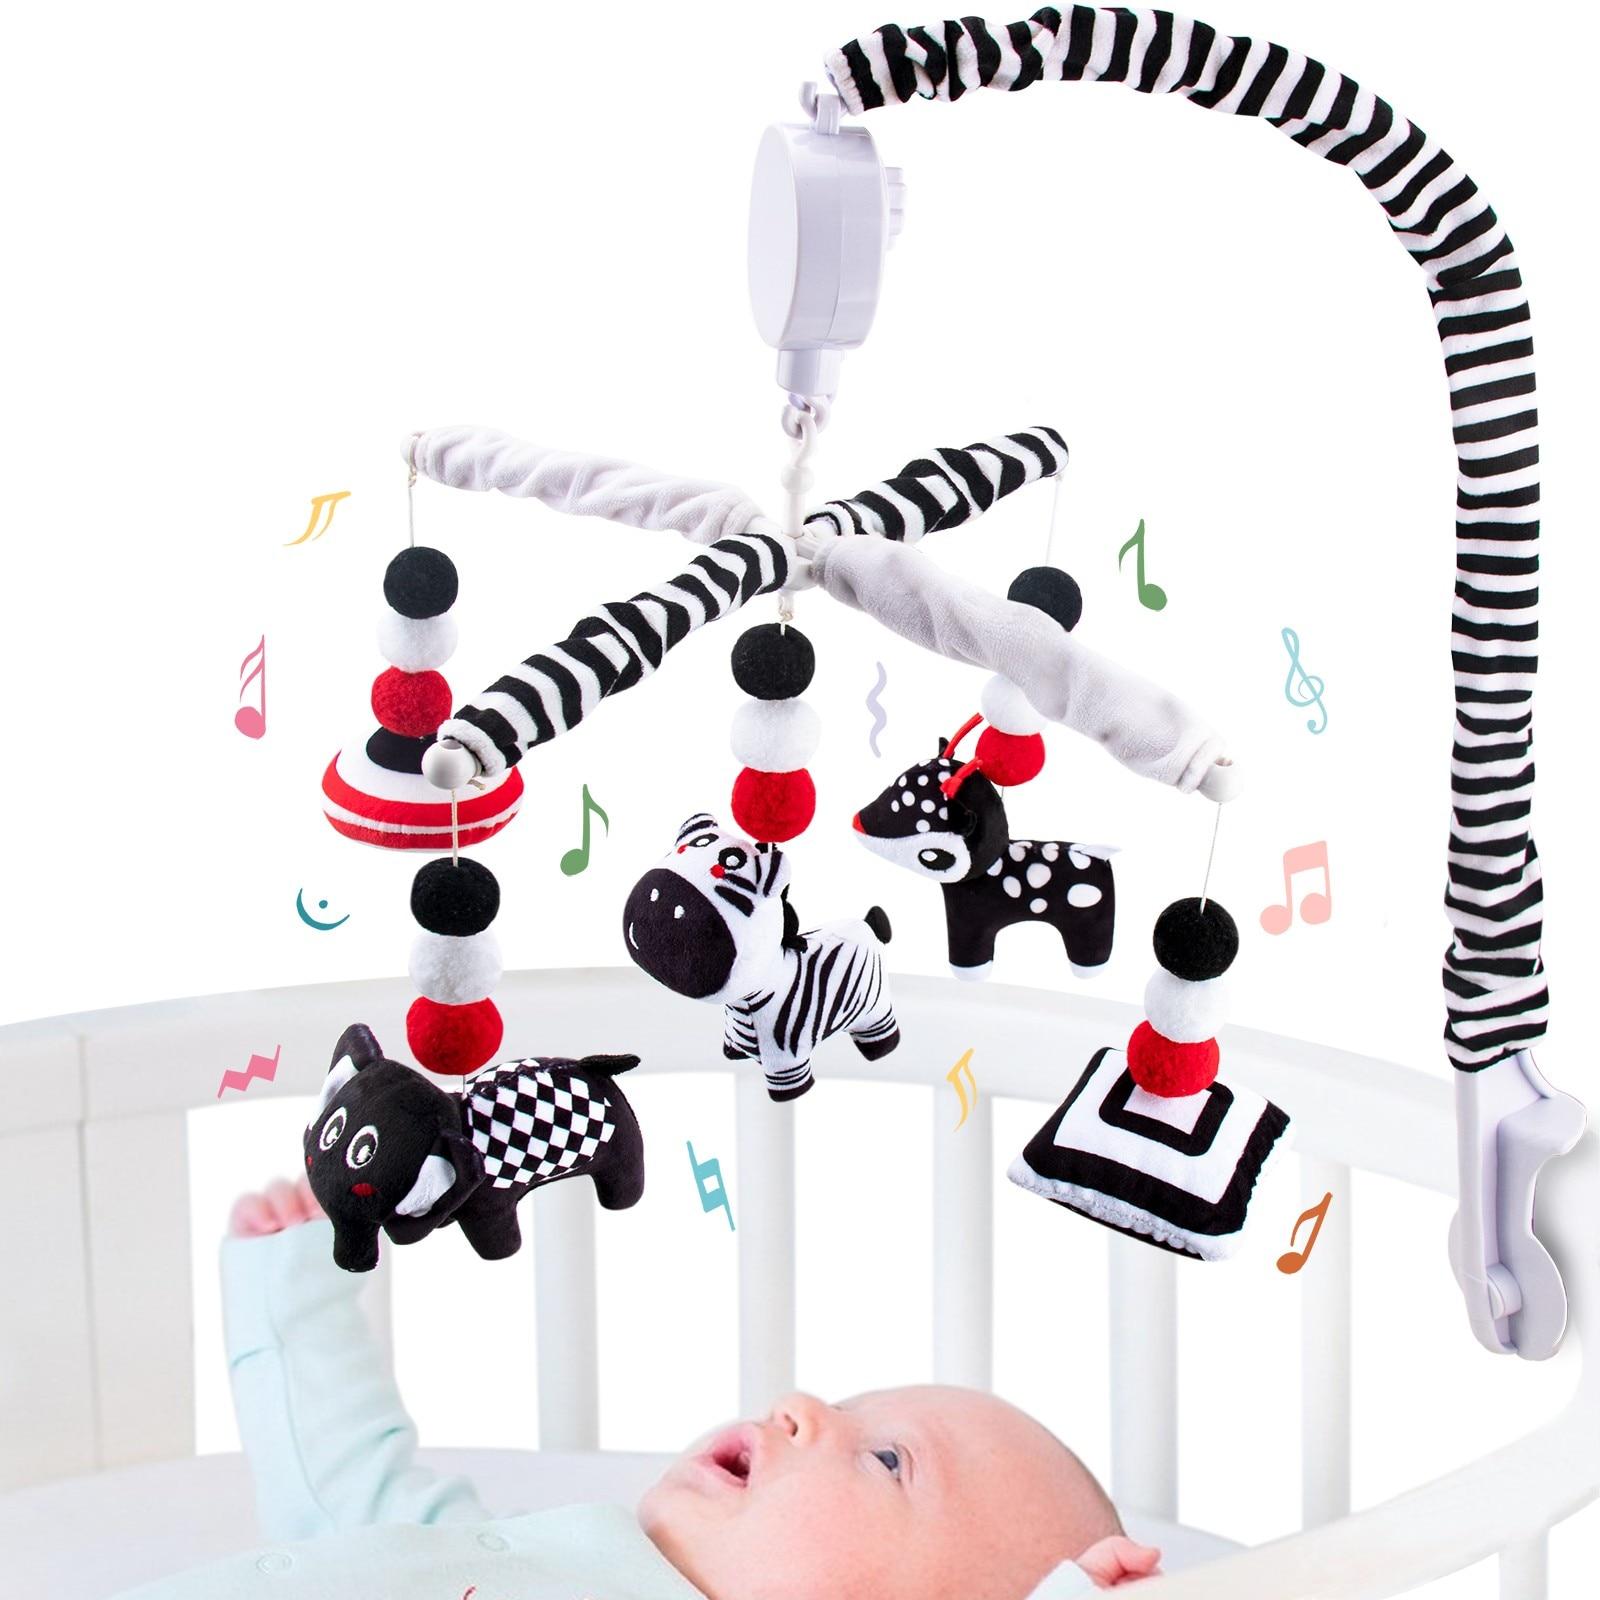 Teytoy My First Baby Mobile, مونتيسوري أبيض وأسود سرير متنقل لعب عالية التباين مهد متنقل للأطفال حديثي الولادة